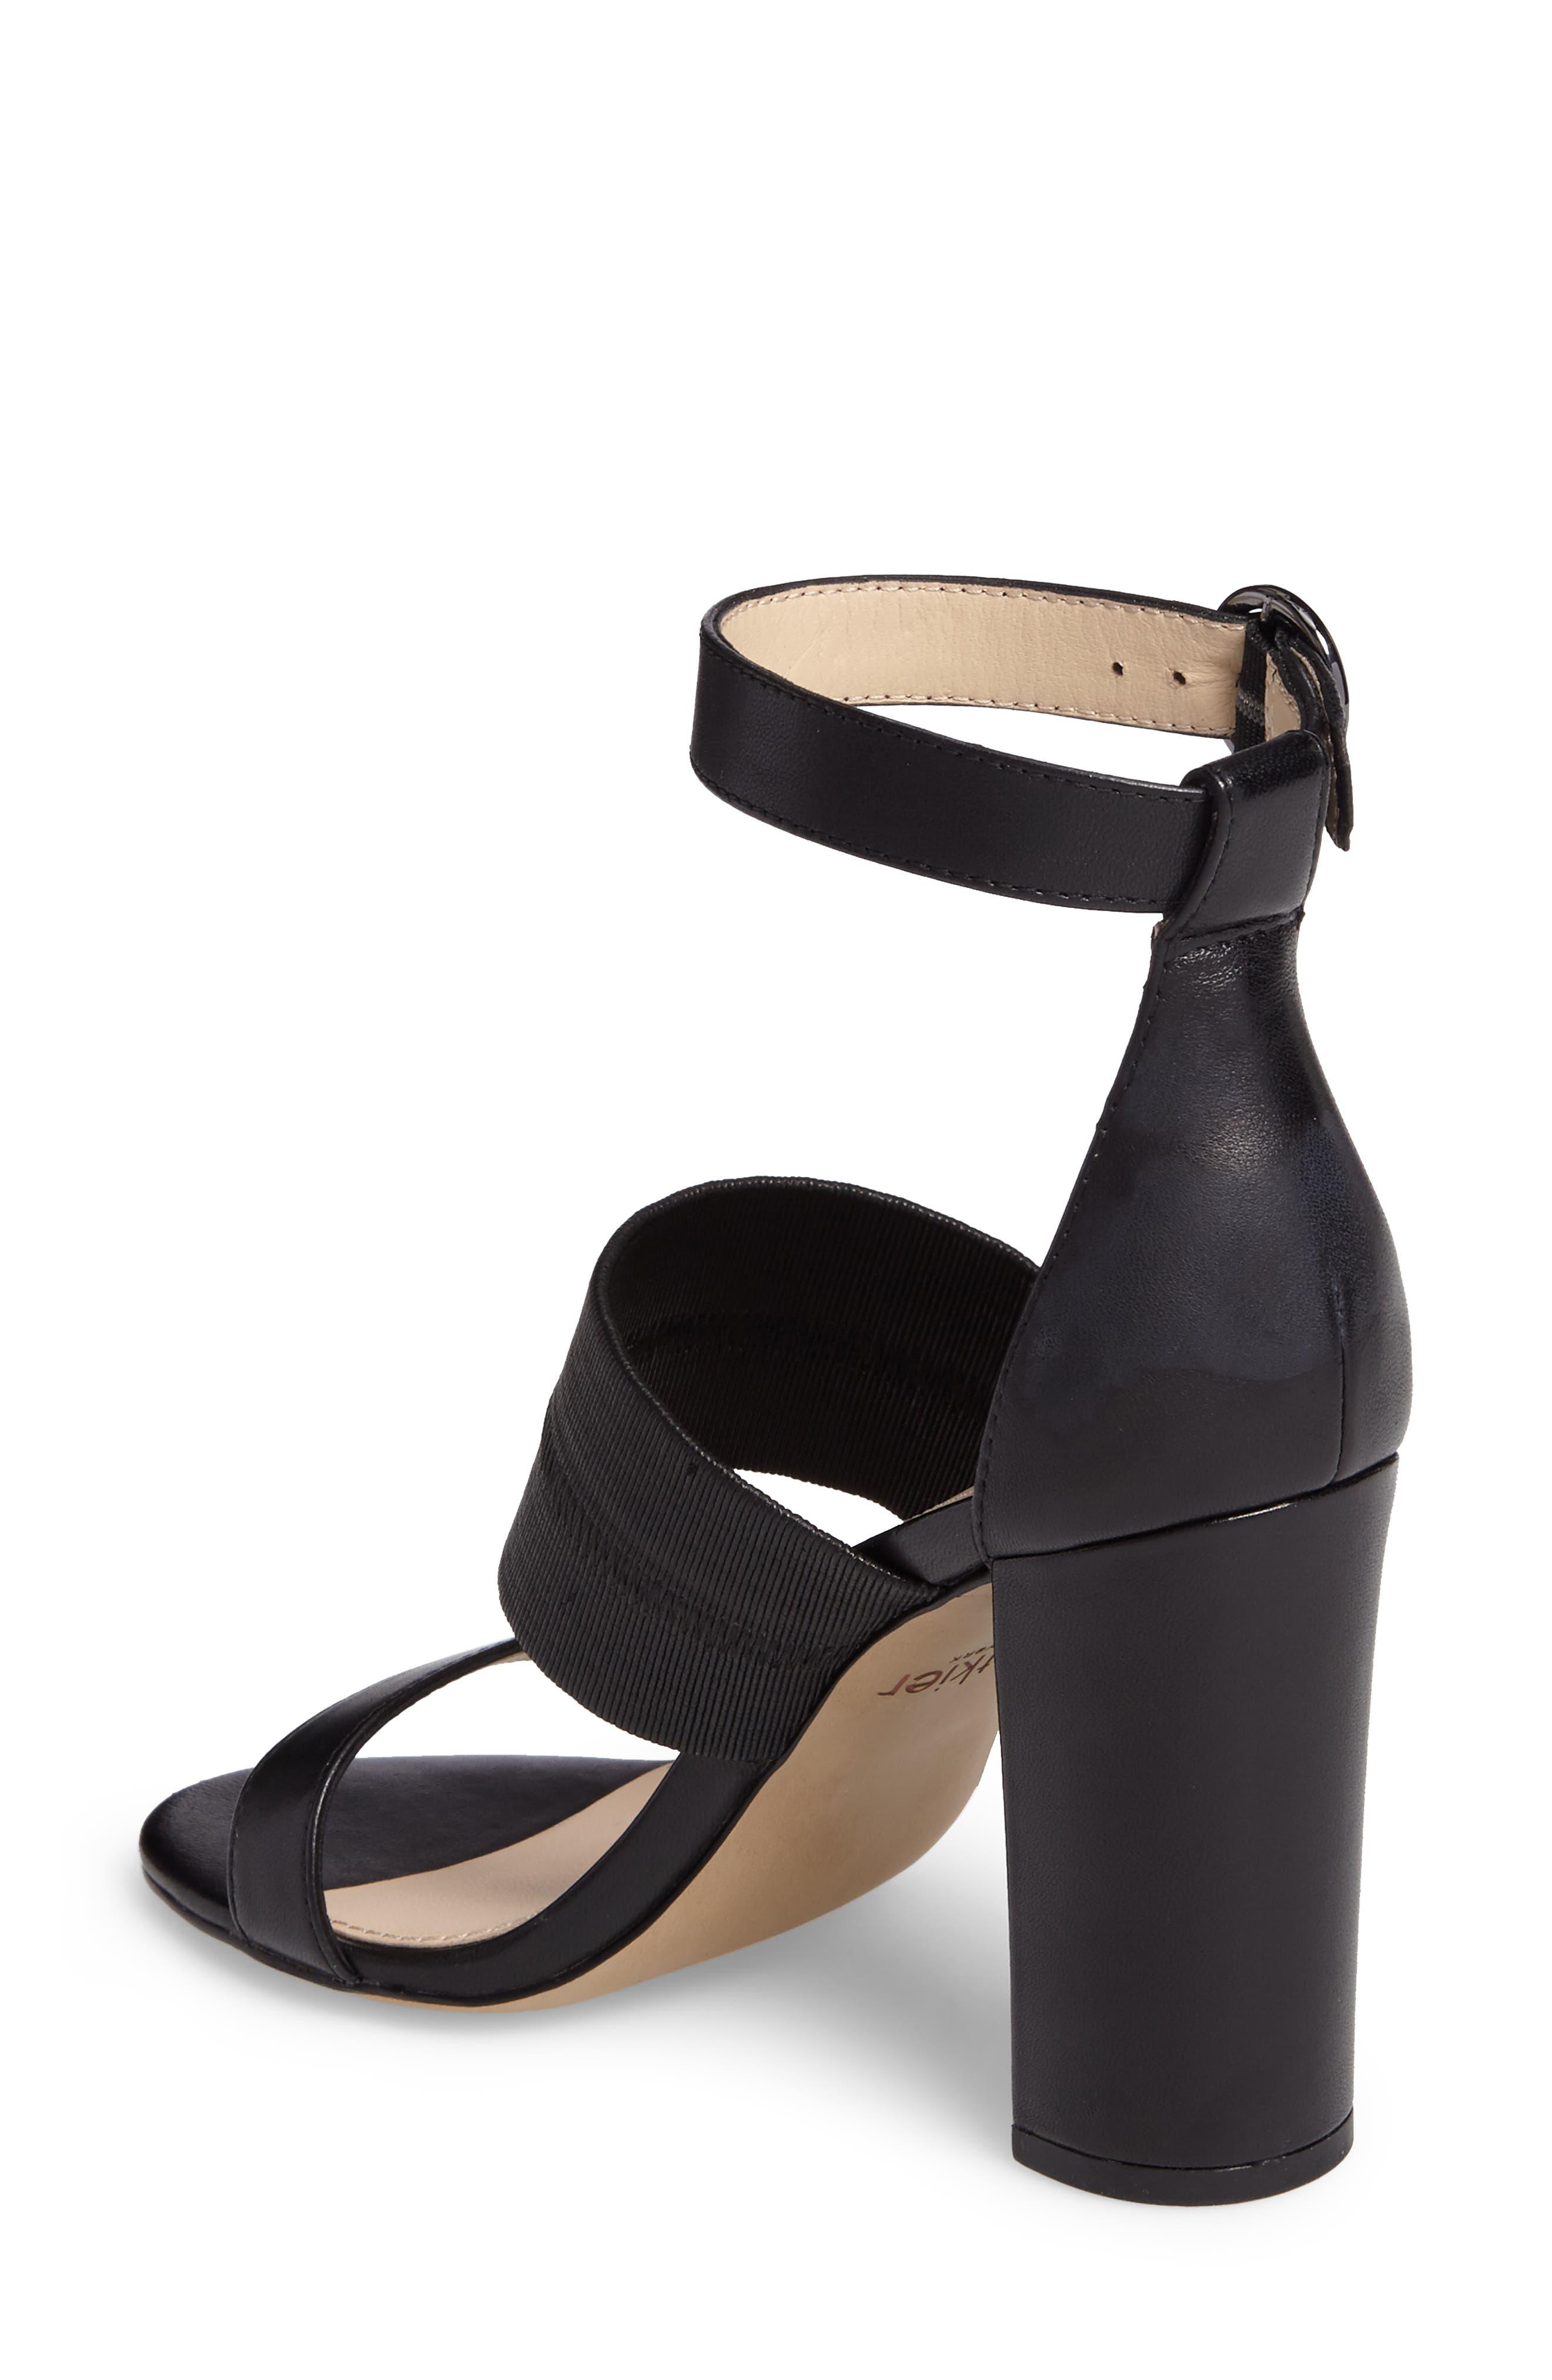 Gisella Ankle Strap Sandal,                             Alternate thumbnail 2, color,                             001